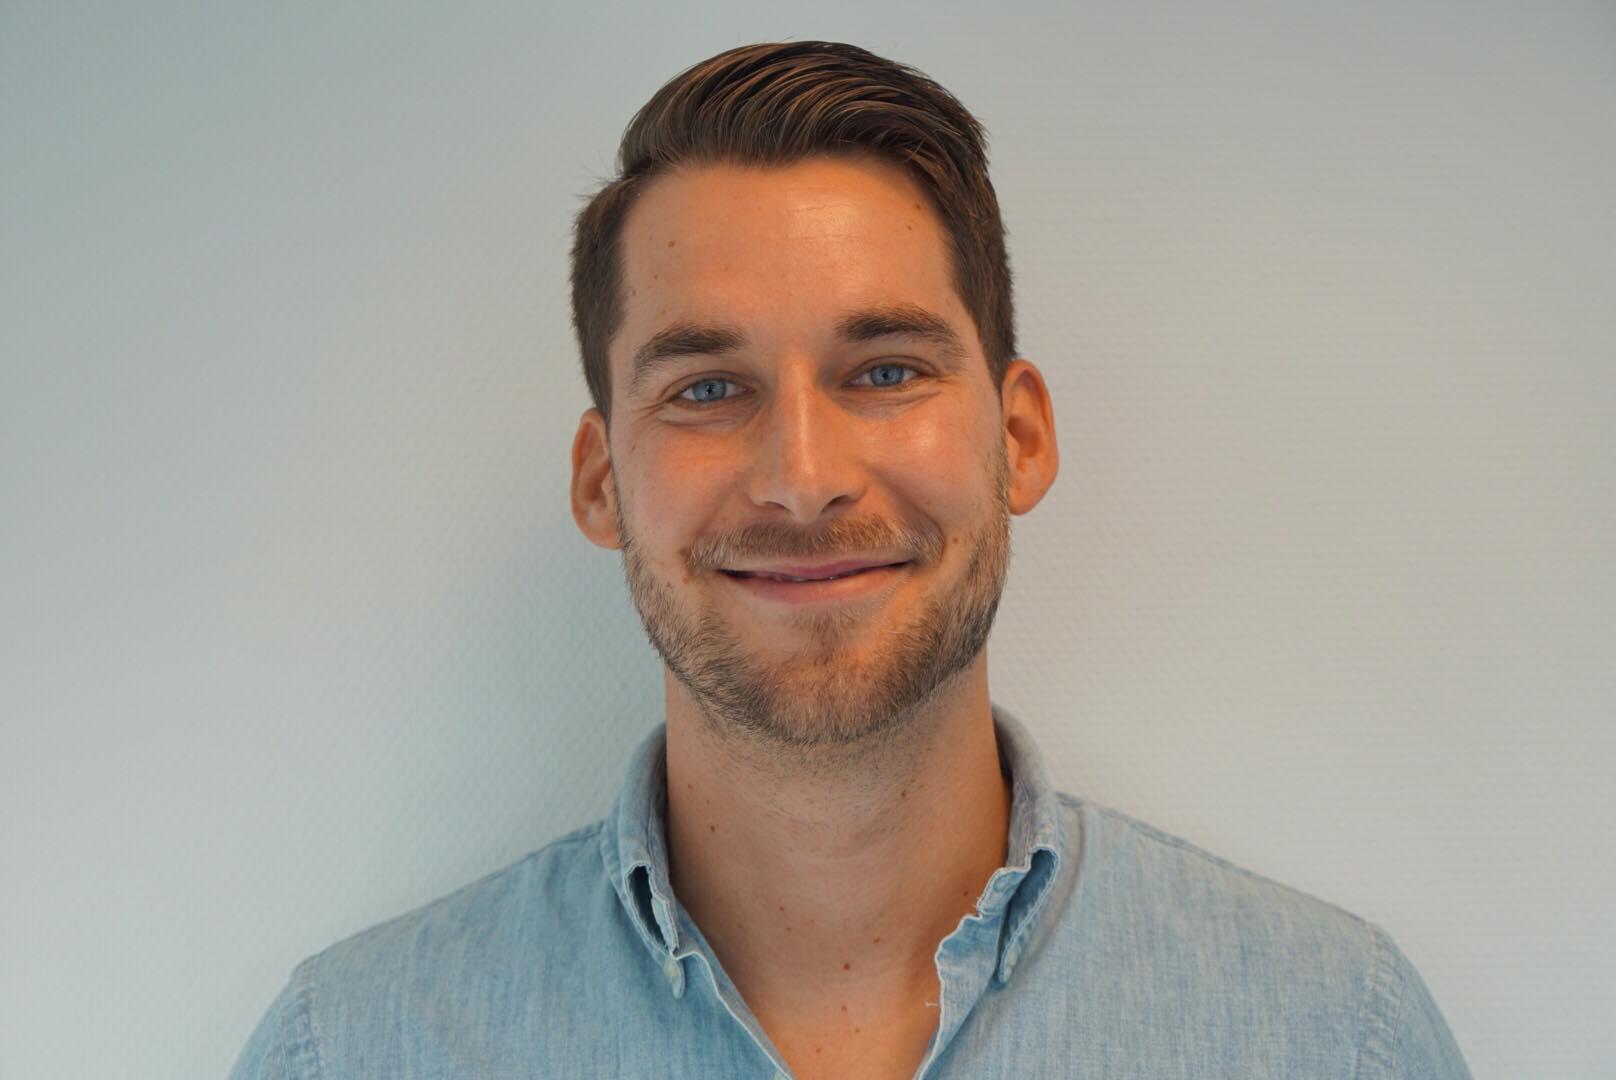 Christofer Bäckstrand